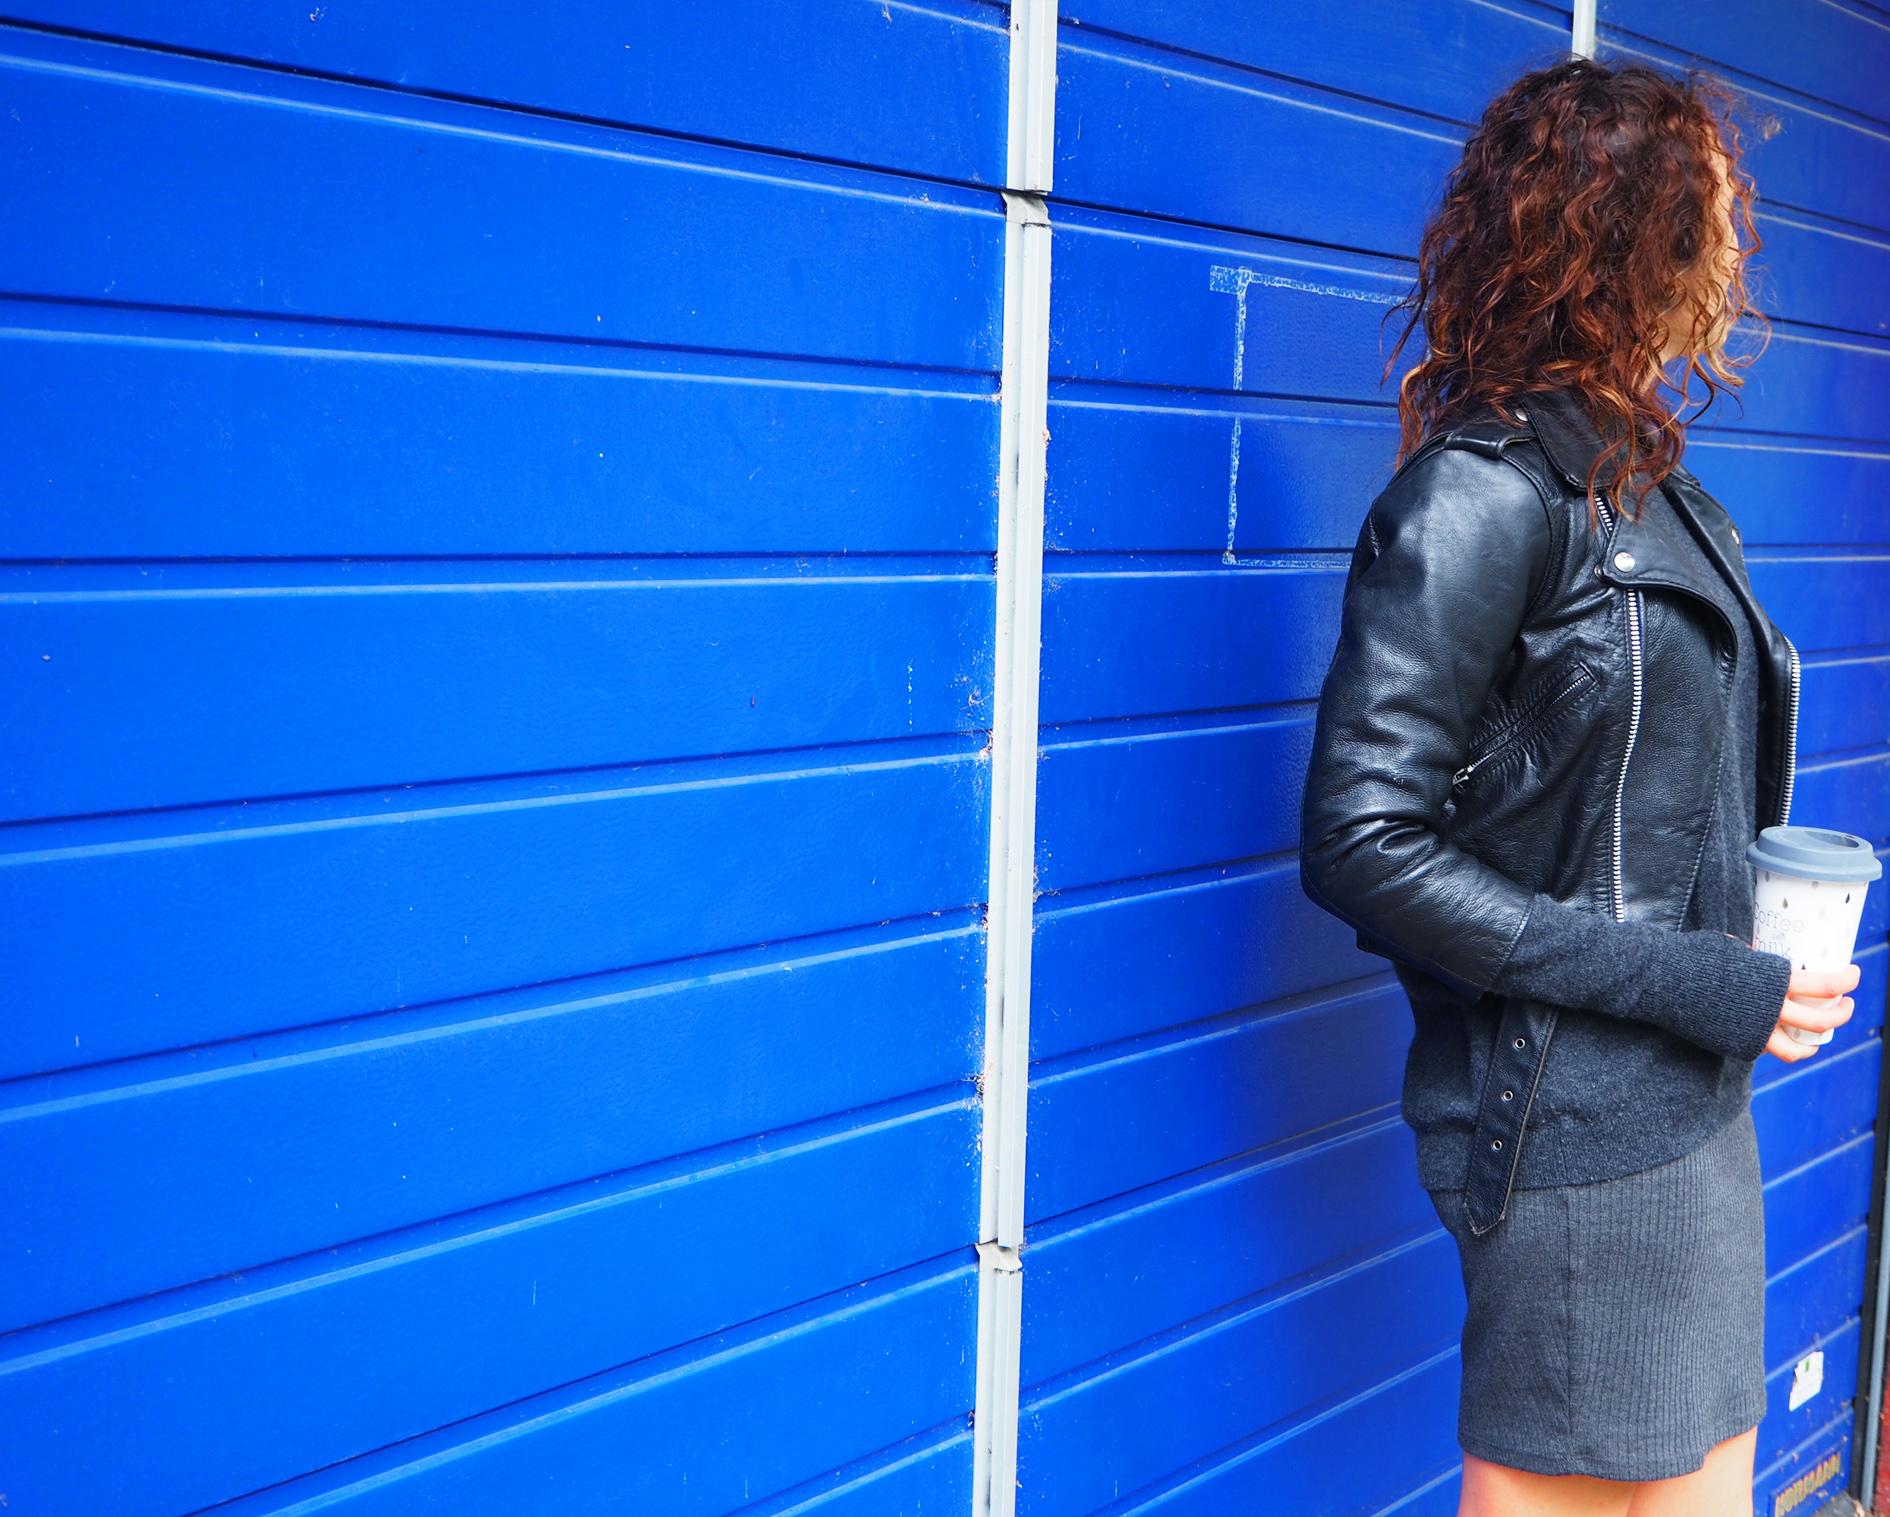 perfecto cuir look rock femme accessoire cuir look ten dances automne 2016